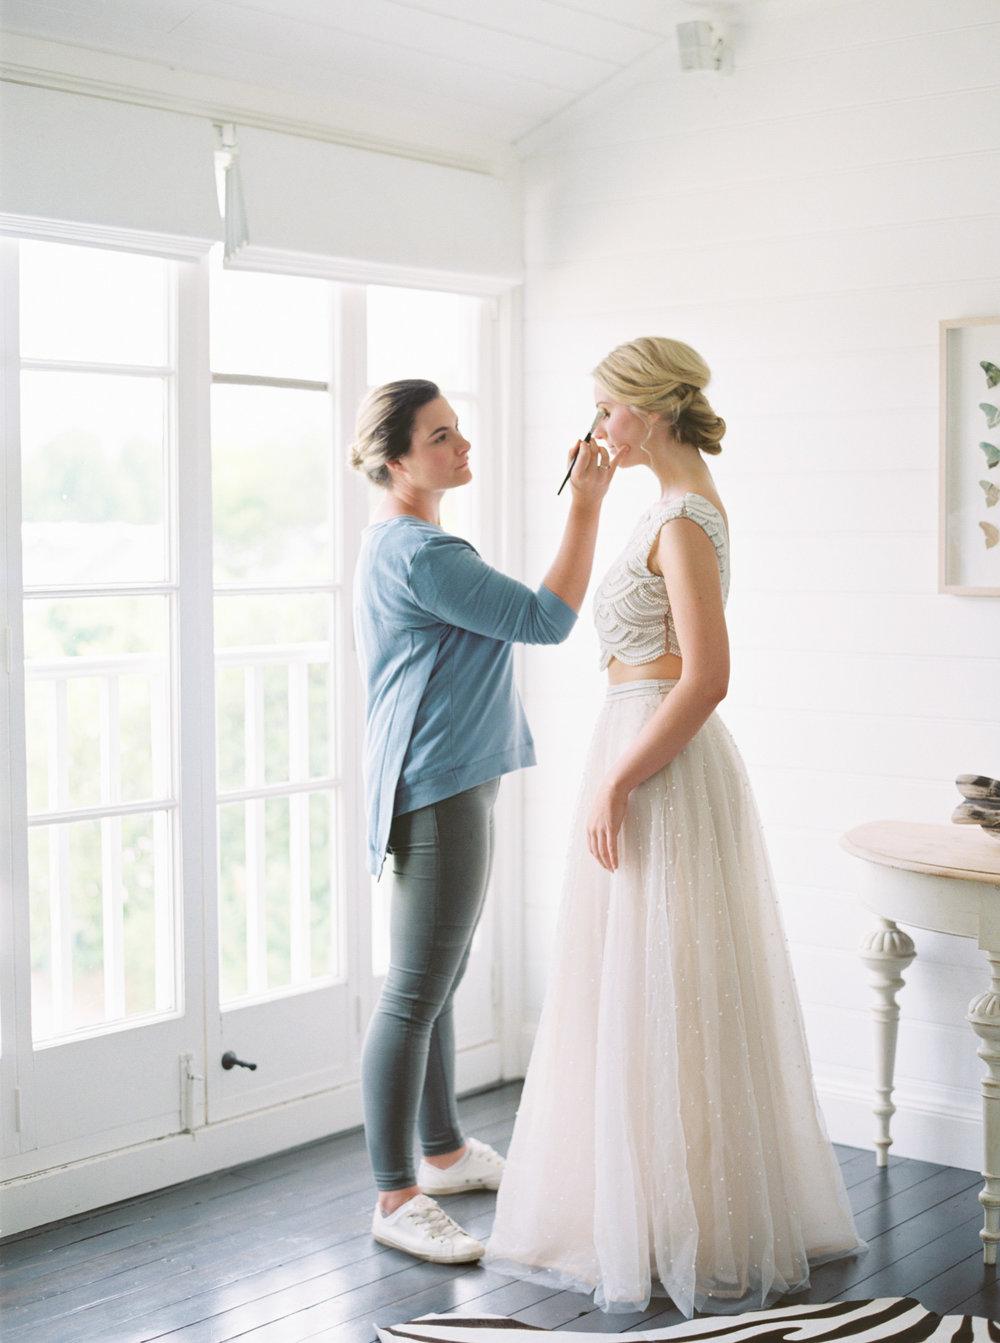 Timeless Southern Highland Wedding Elopement in Bowral NSW Fine Art Film Photographer Sheri McMahon-4.jpg